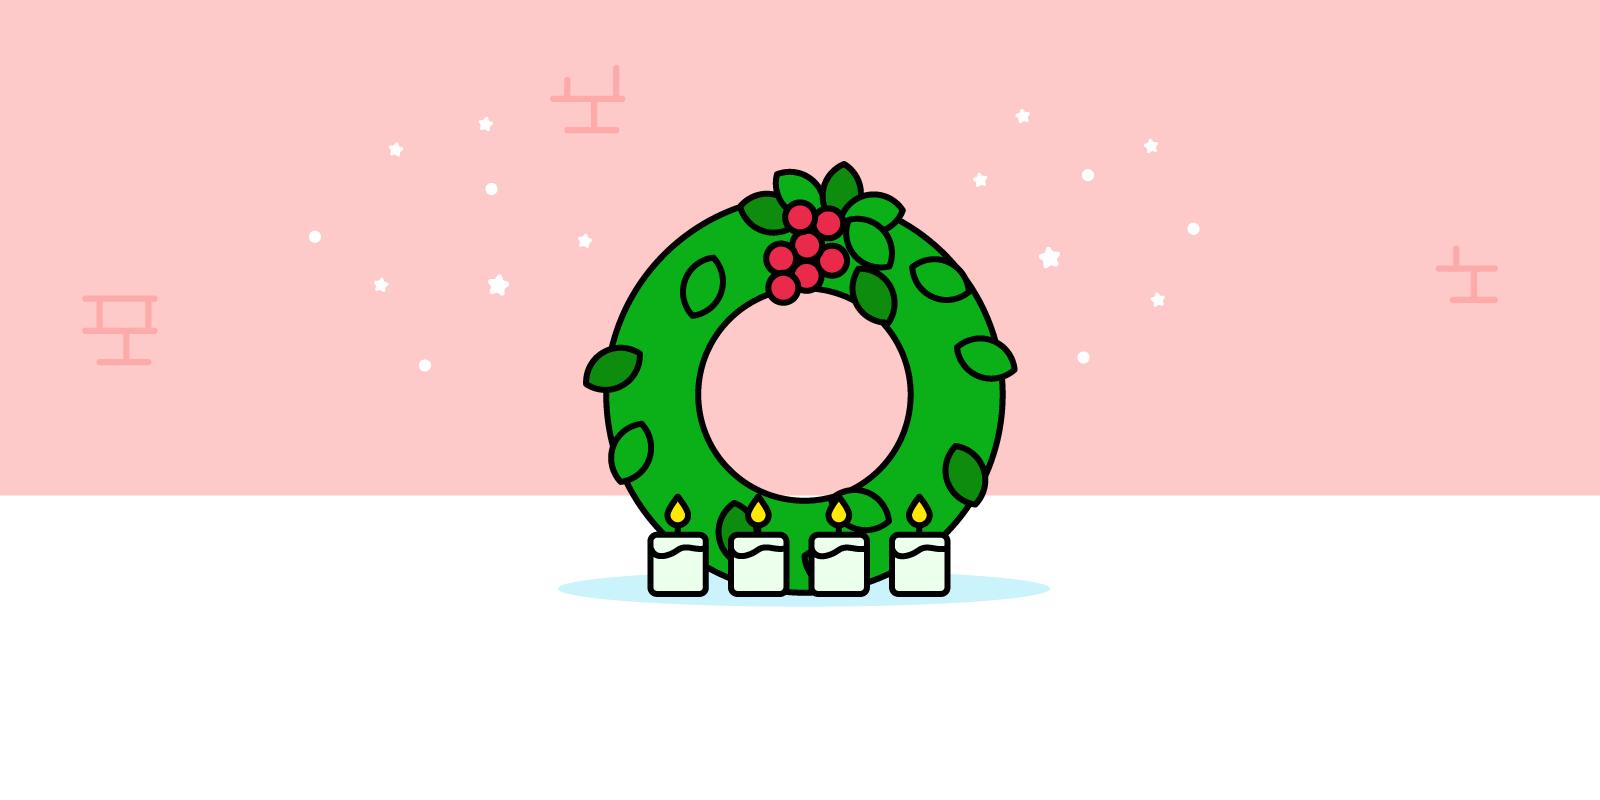 advents-wreath